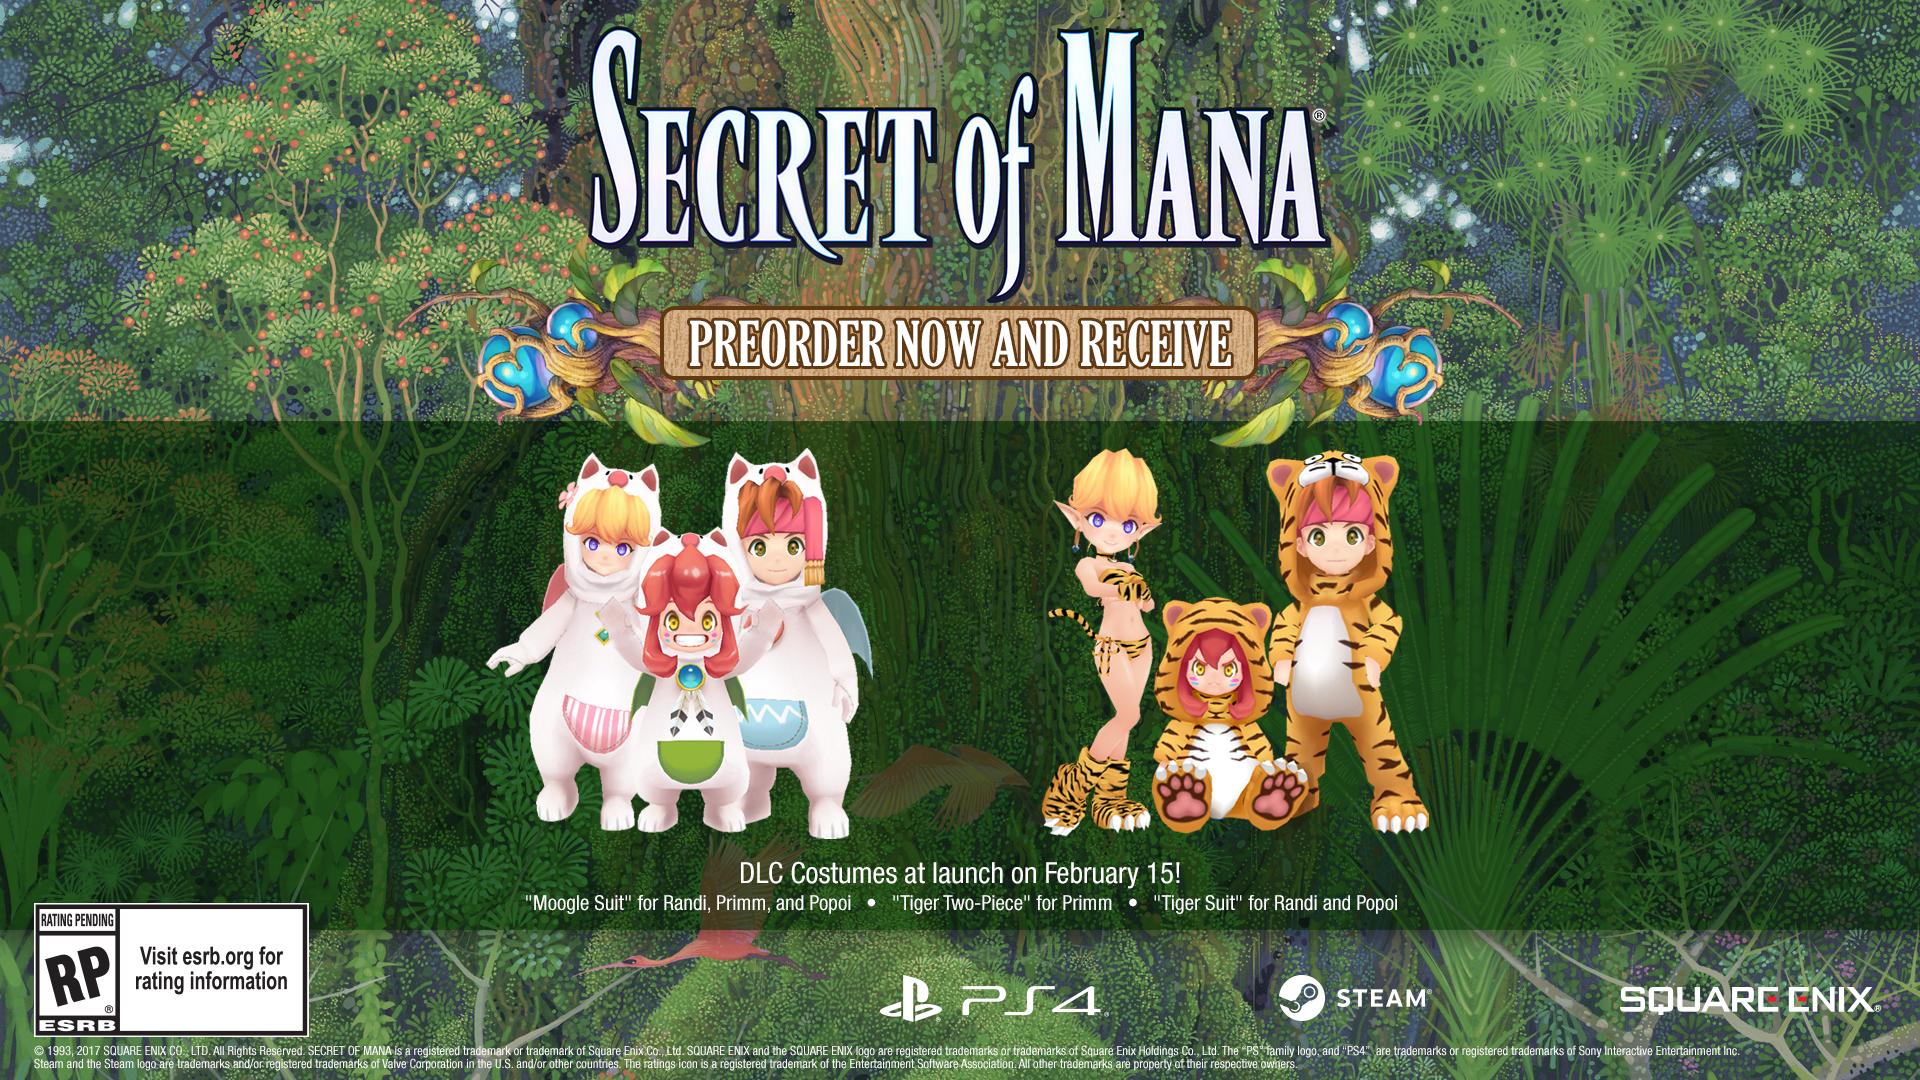 Secret of Mana - pre-order bonuses